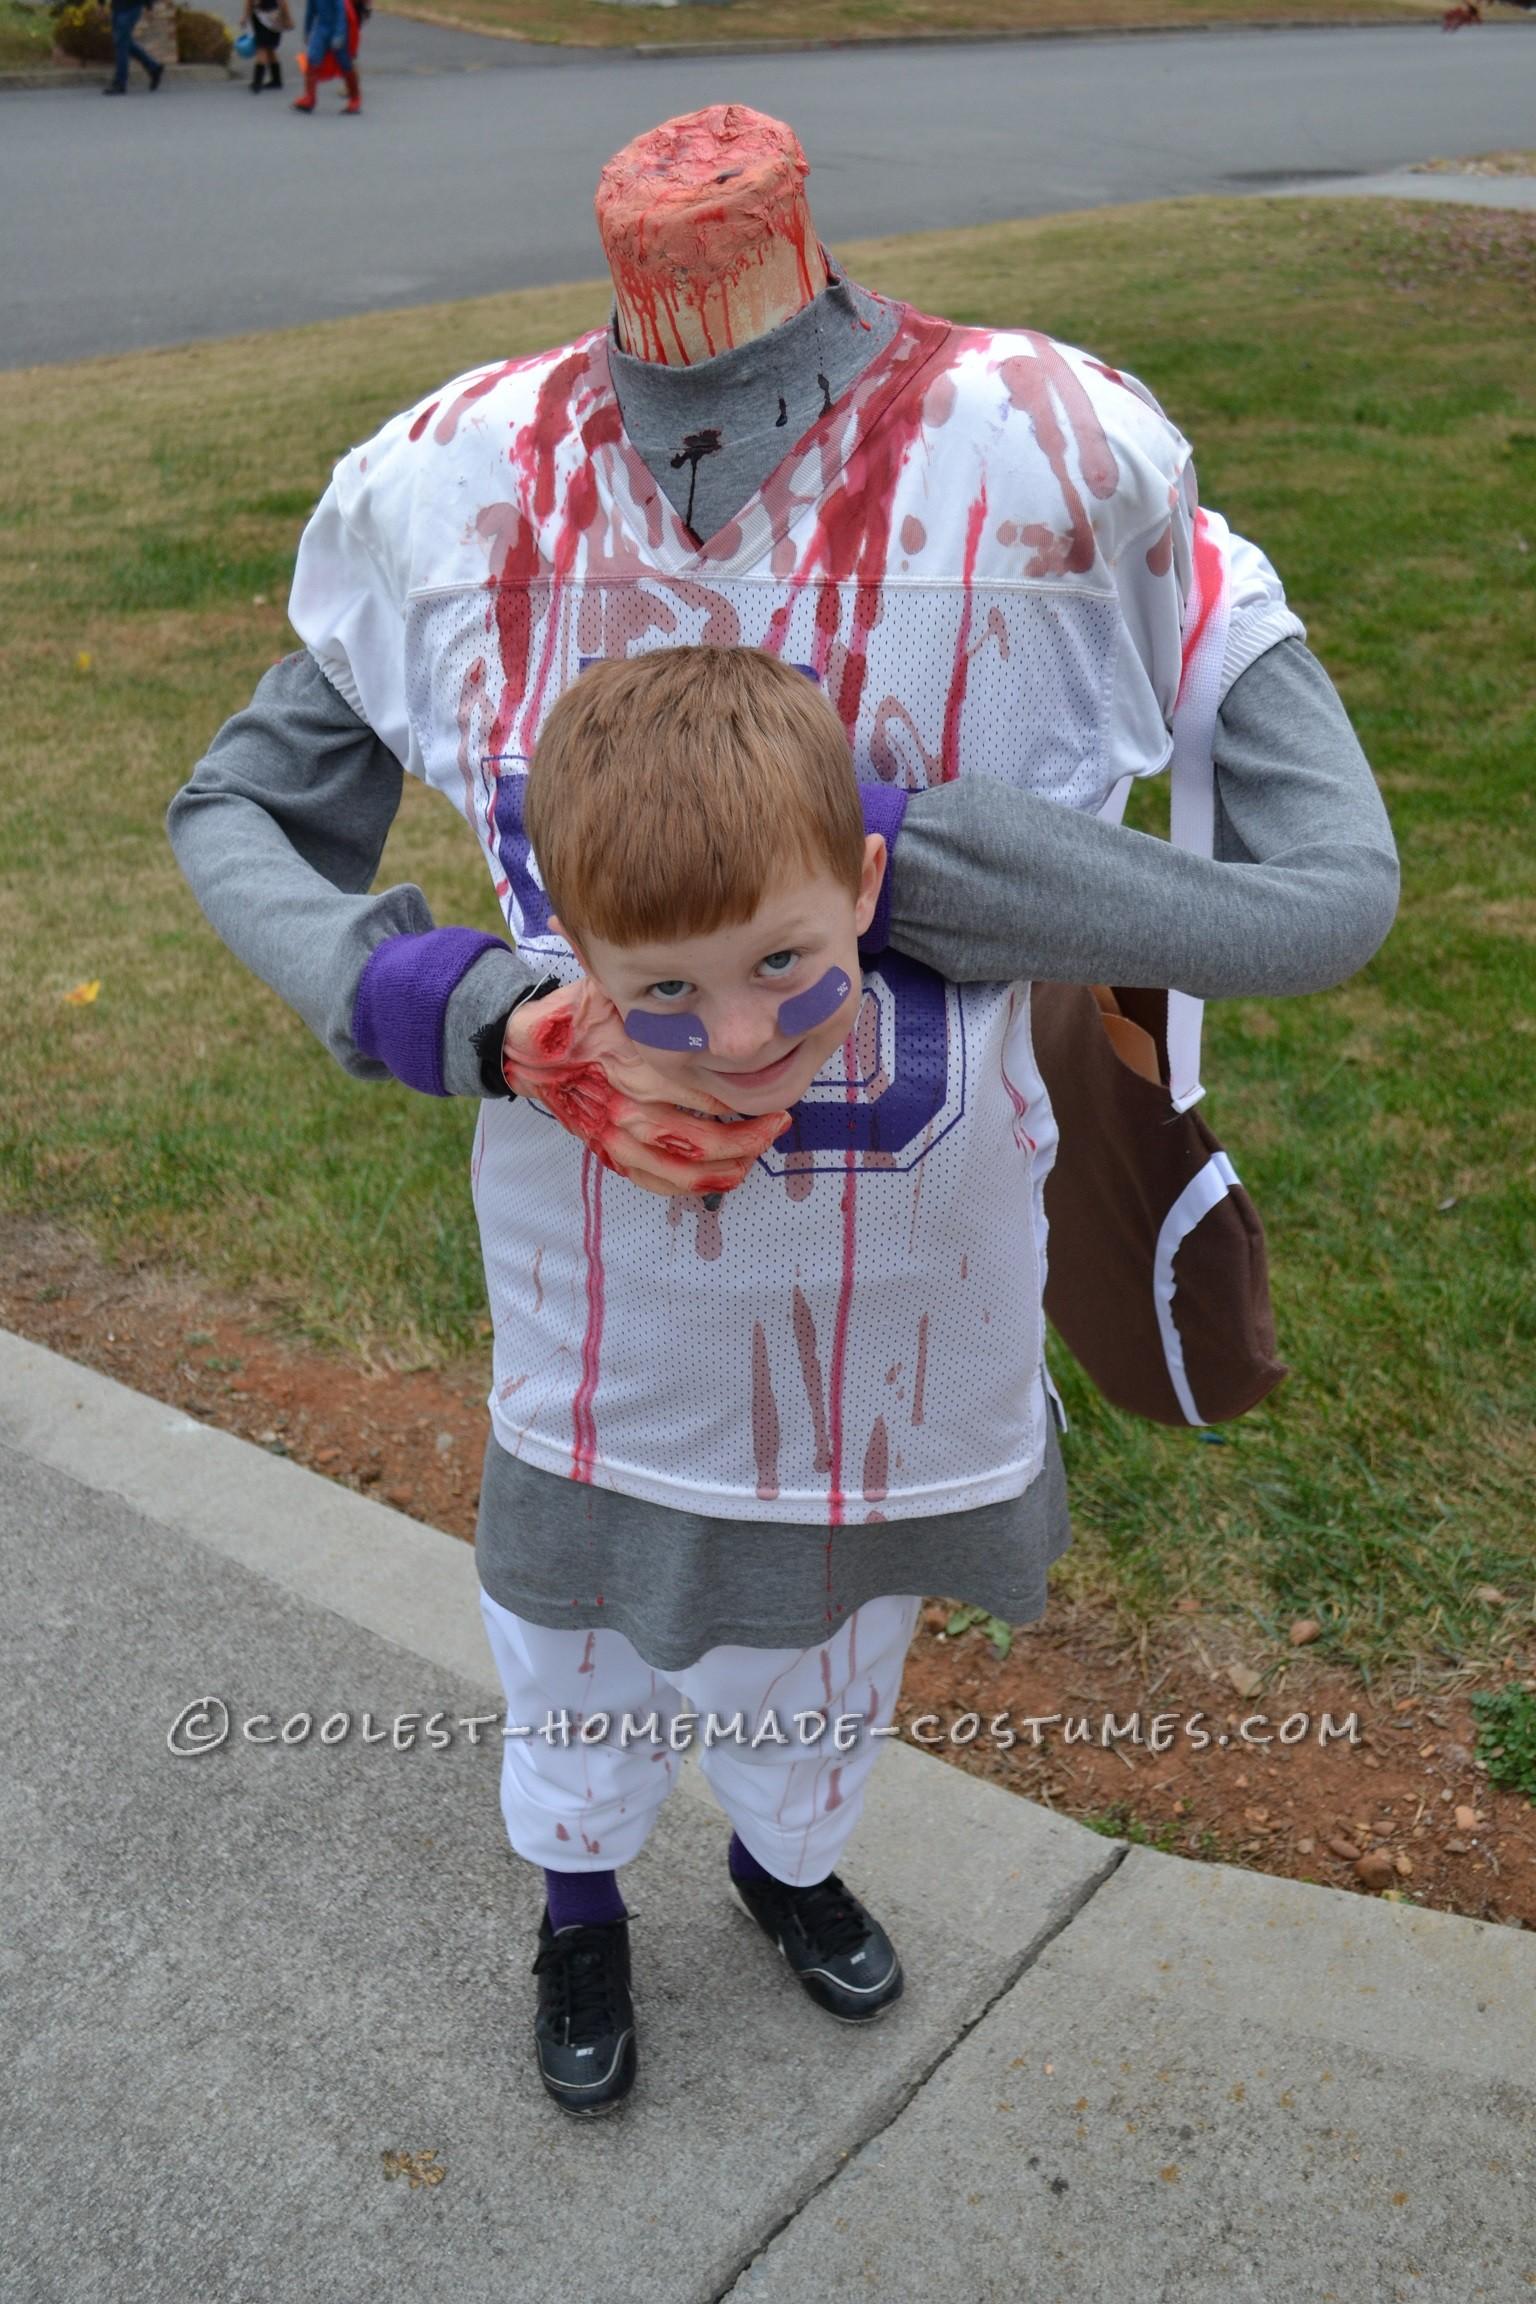 f18241ad22a Scary DIY Headless Football Player Halloween Costume